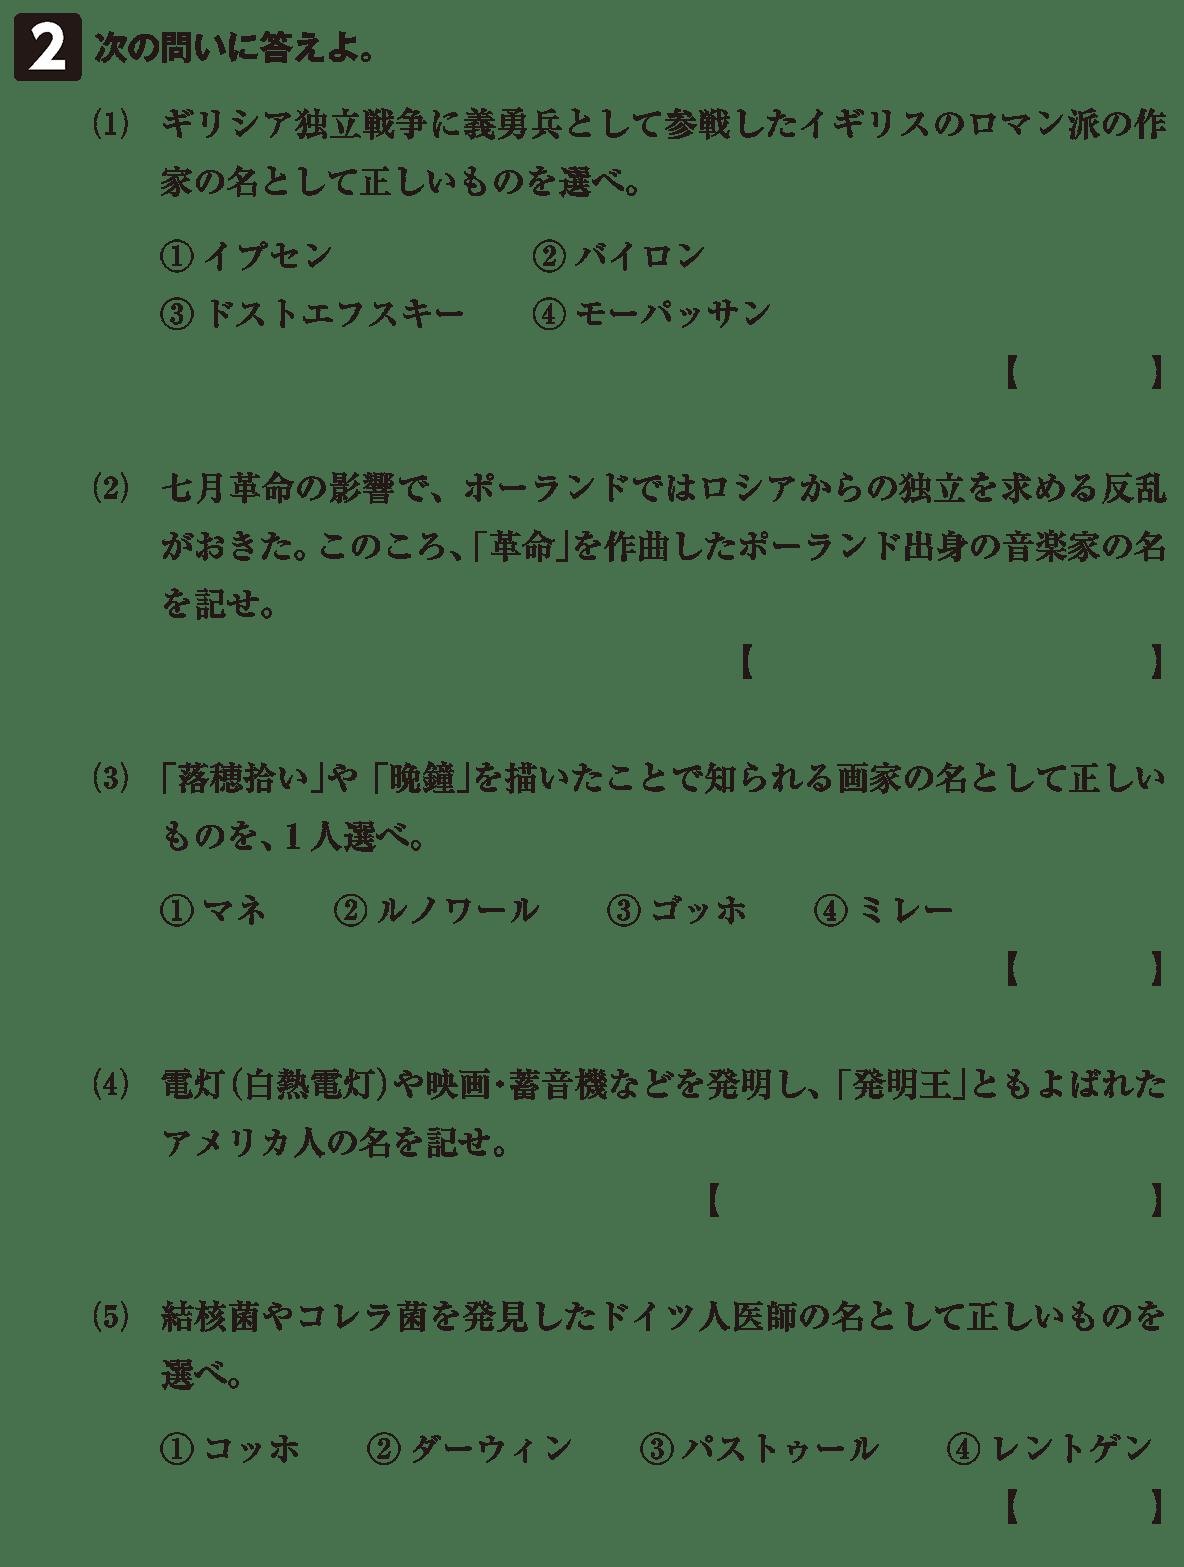 19世紀の欧米諸国(3)19世紀の欧米文化6 確認テスト(後半)問2